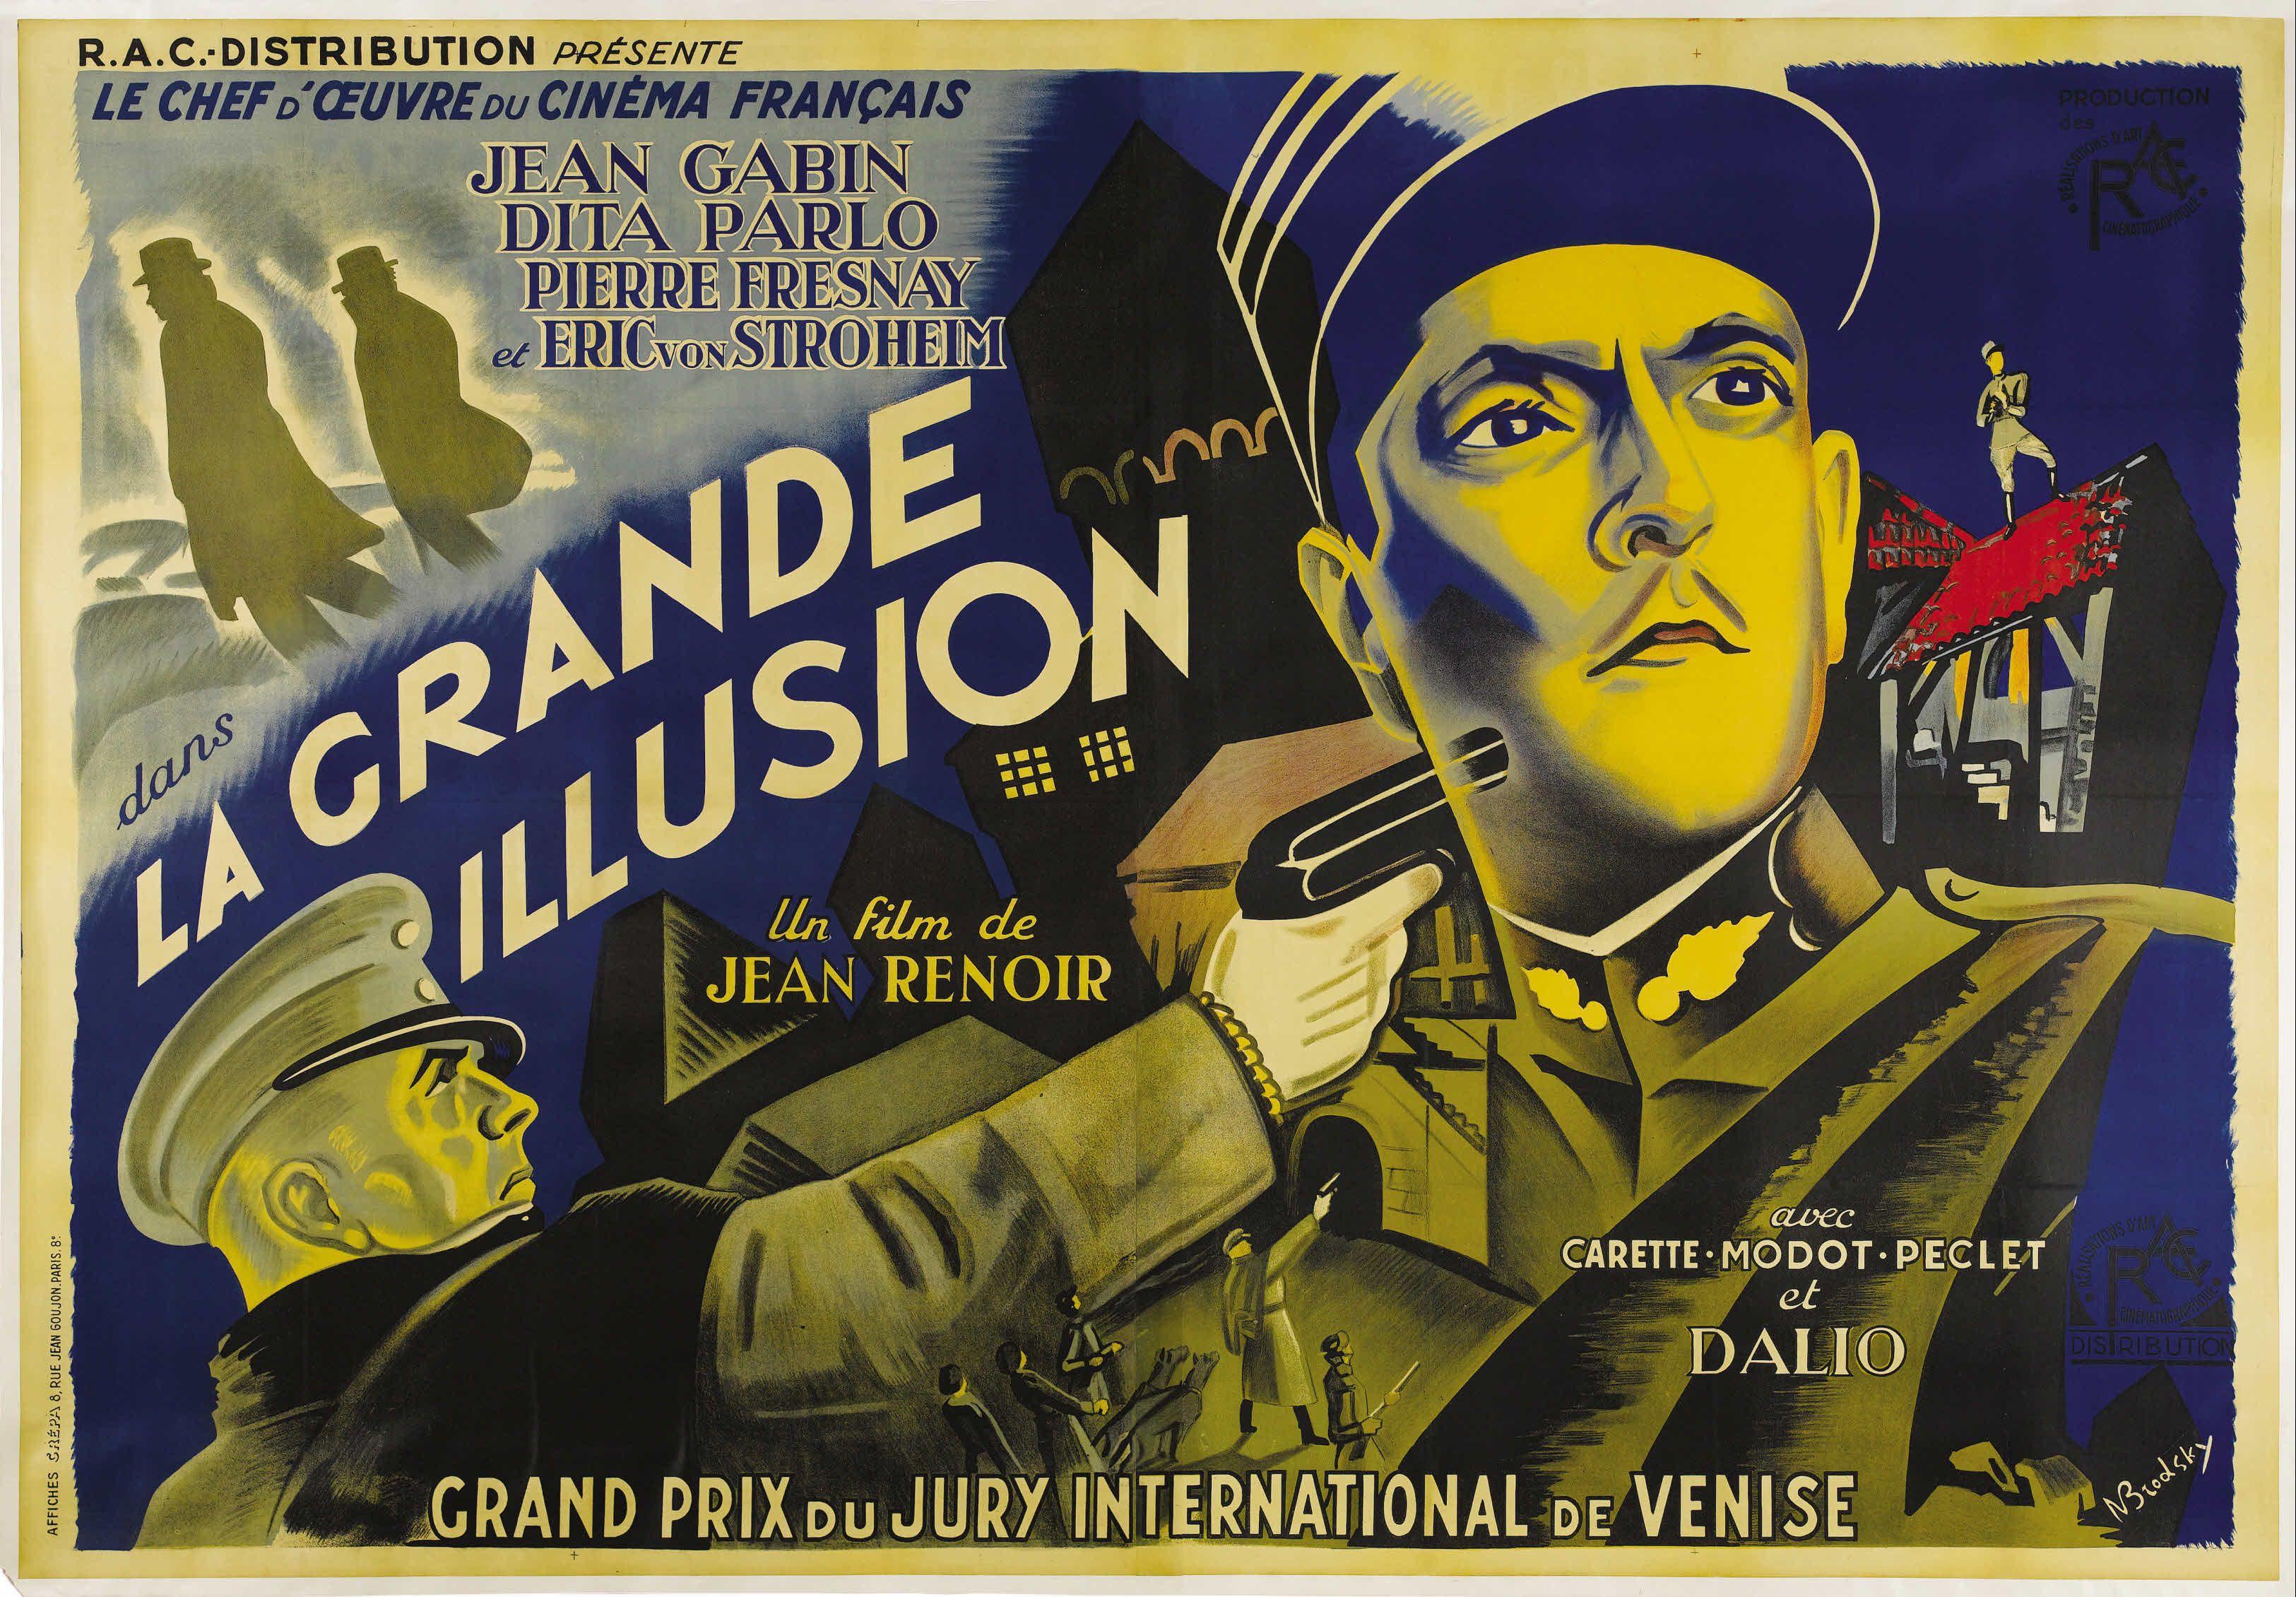 La Grande Illusion | Jean renoir, Affiche de film, Jean gabin